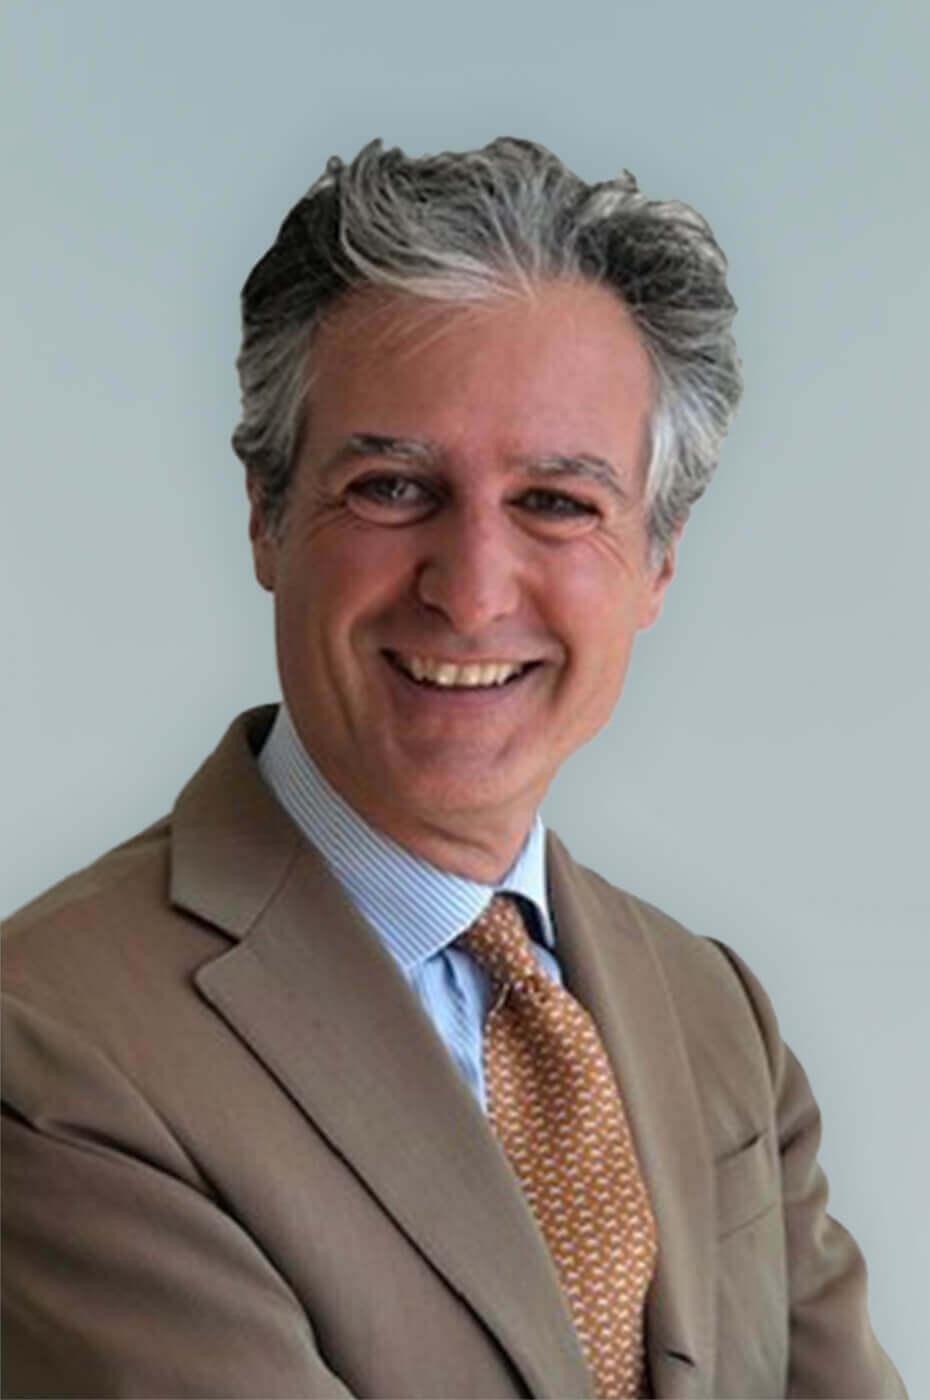 Stefano Valente : Founder & Chairman